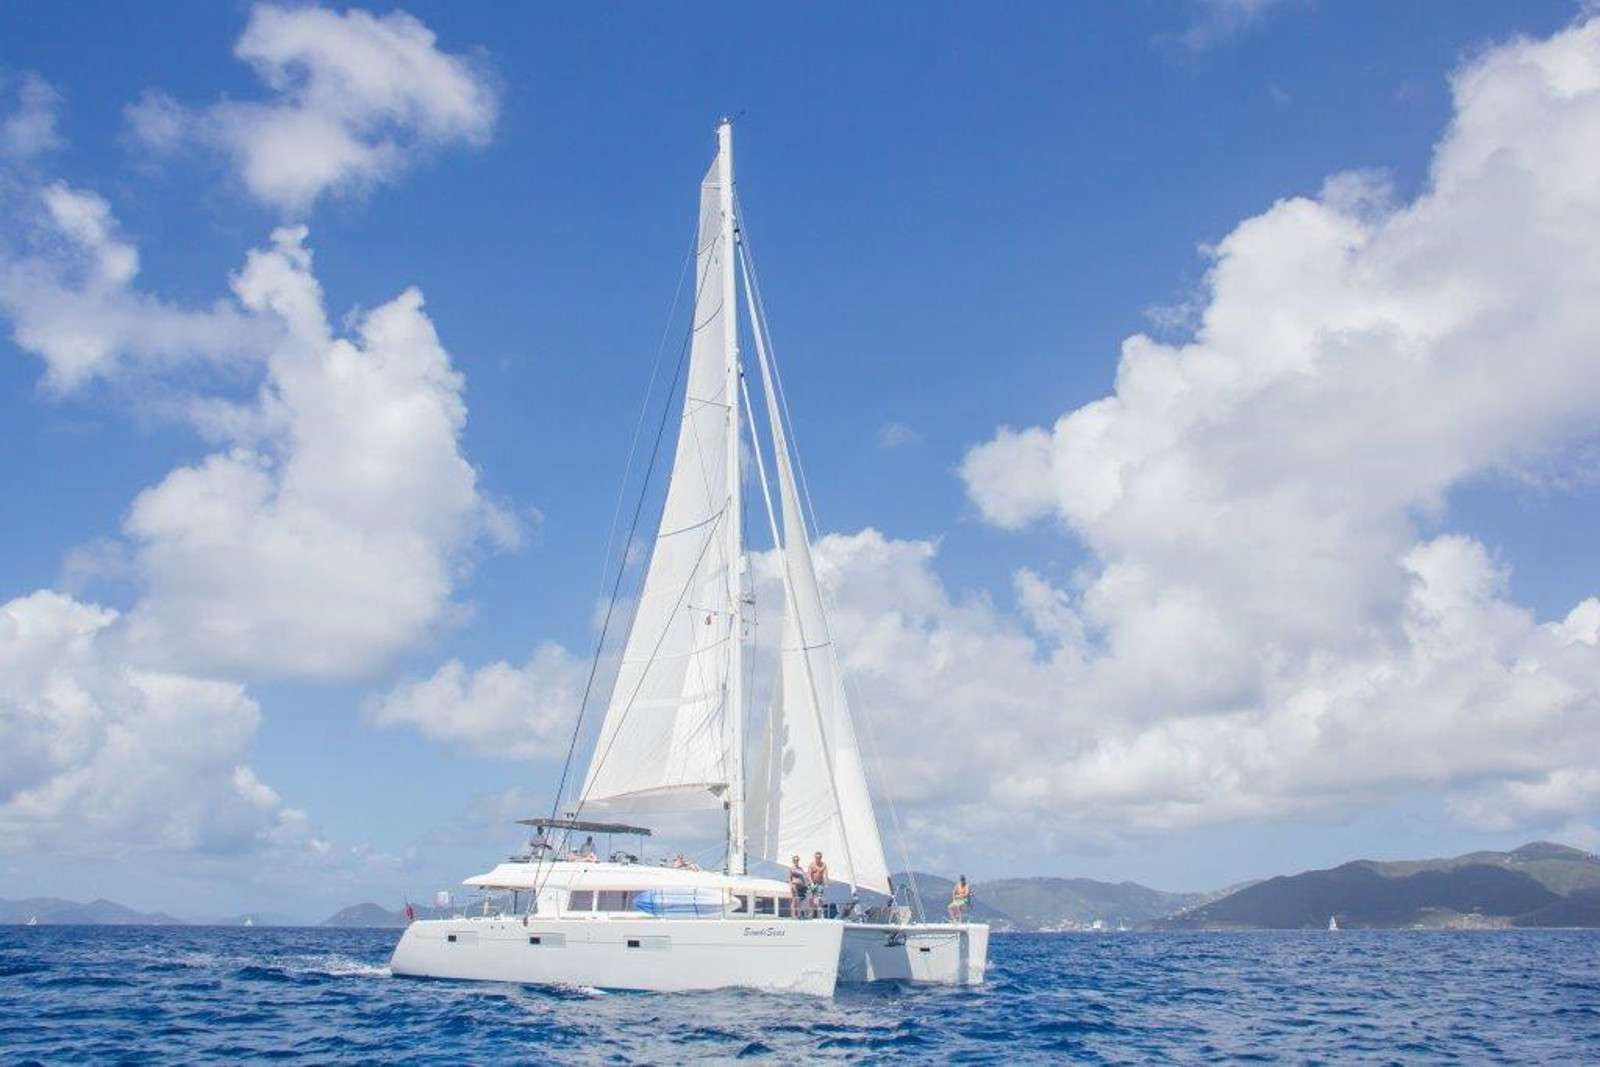 SandiSeas Under Sail